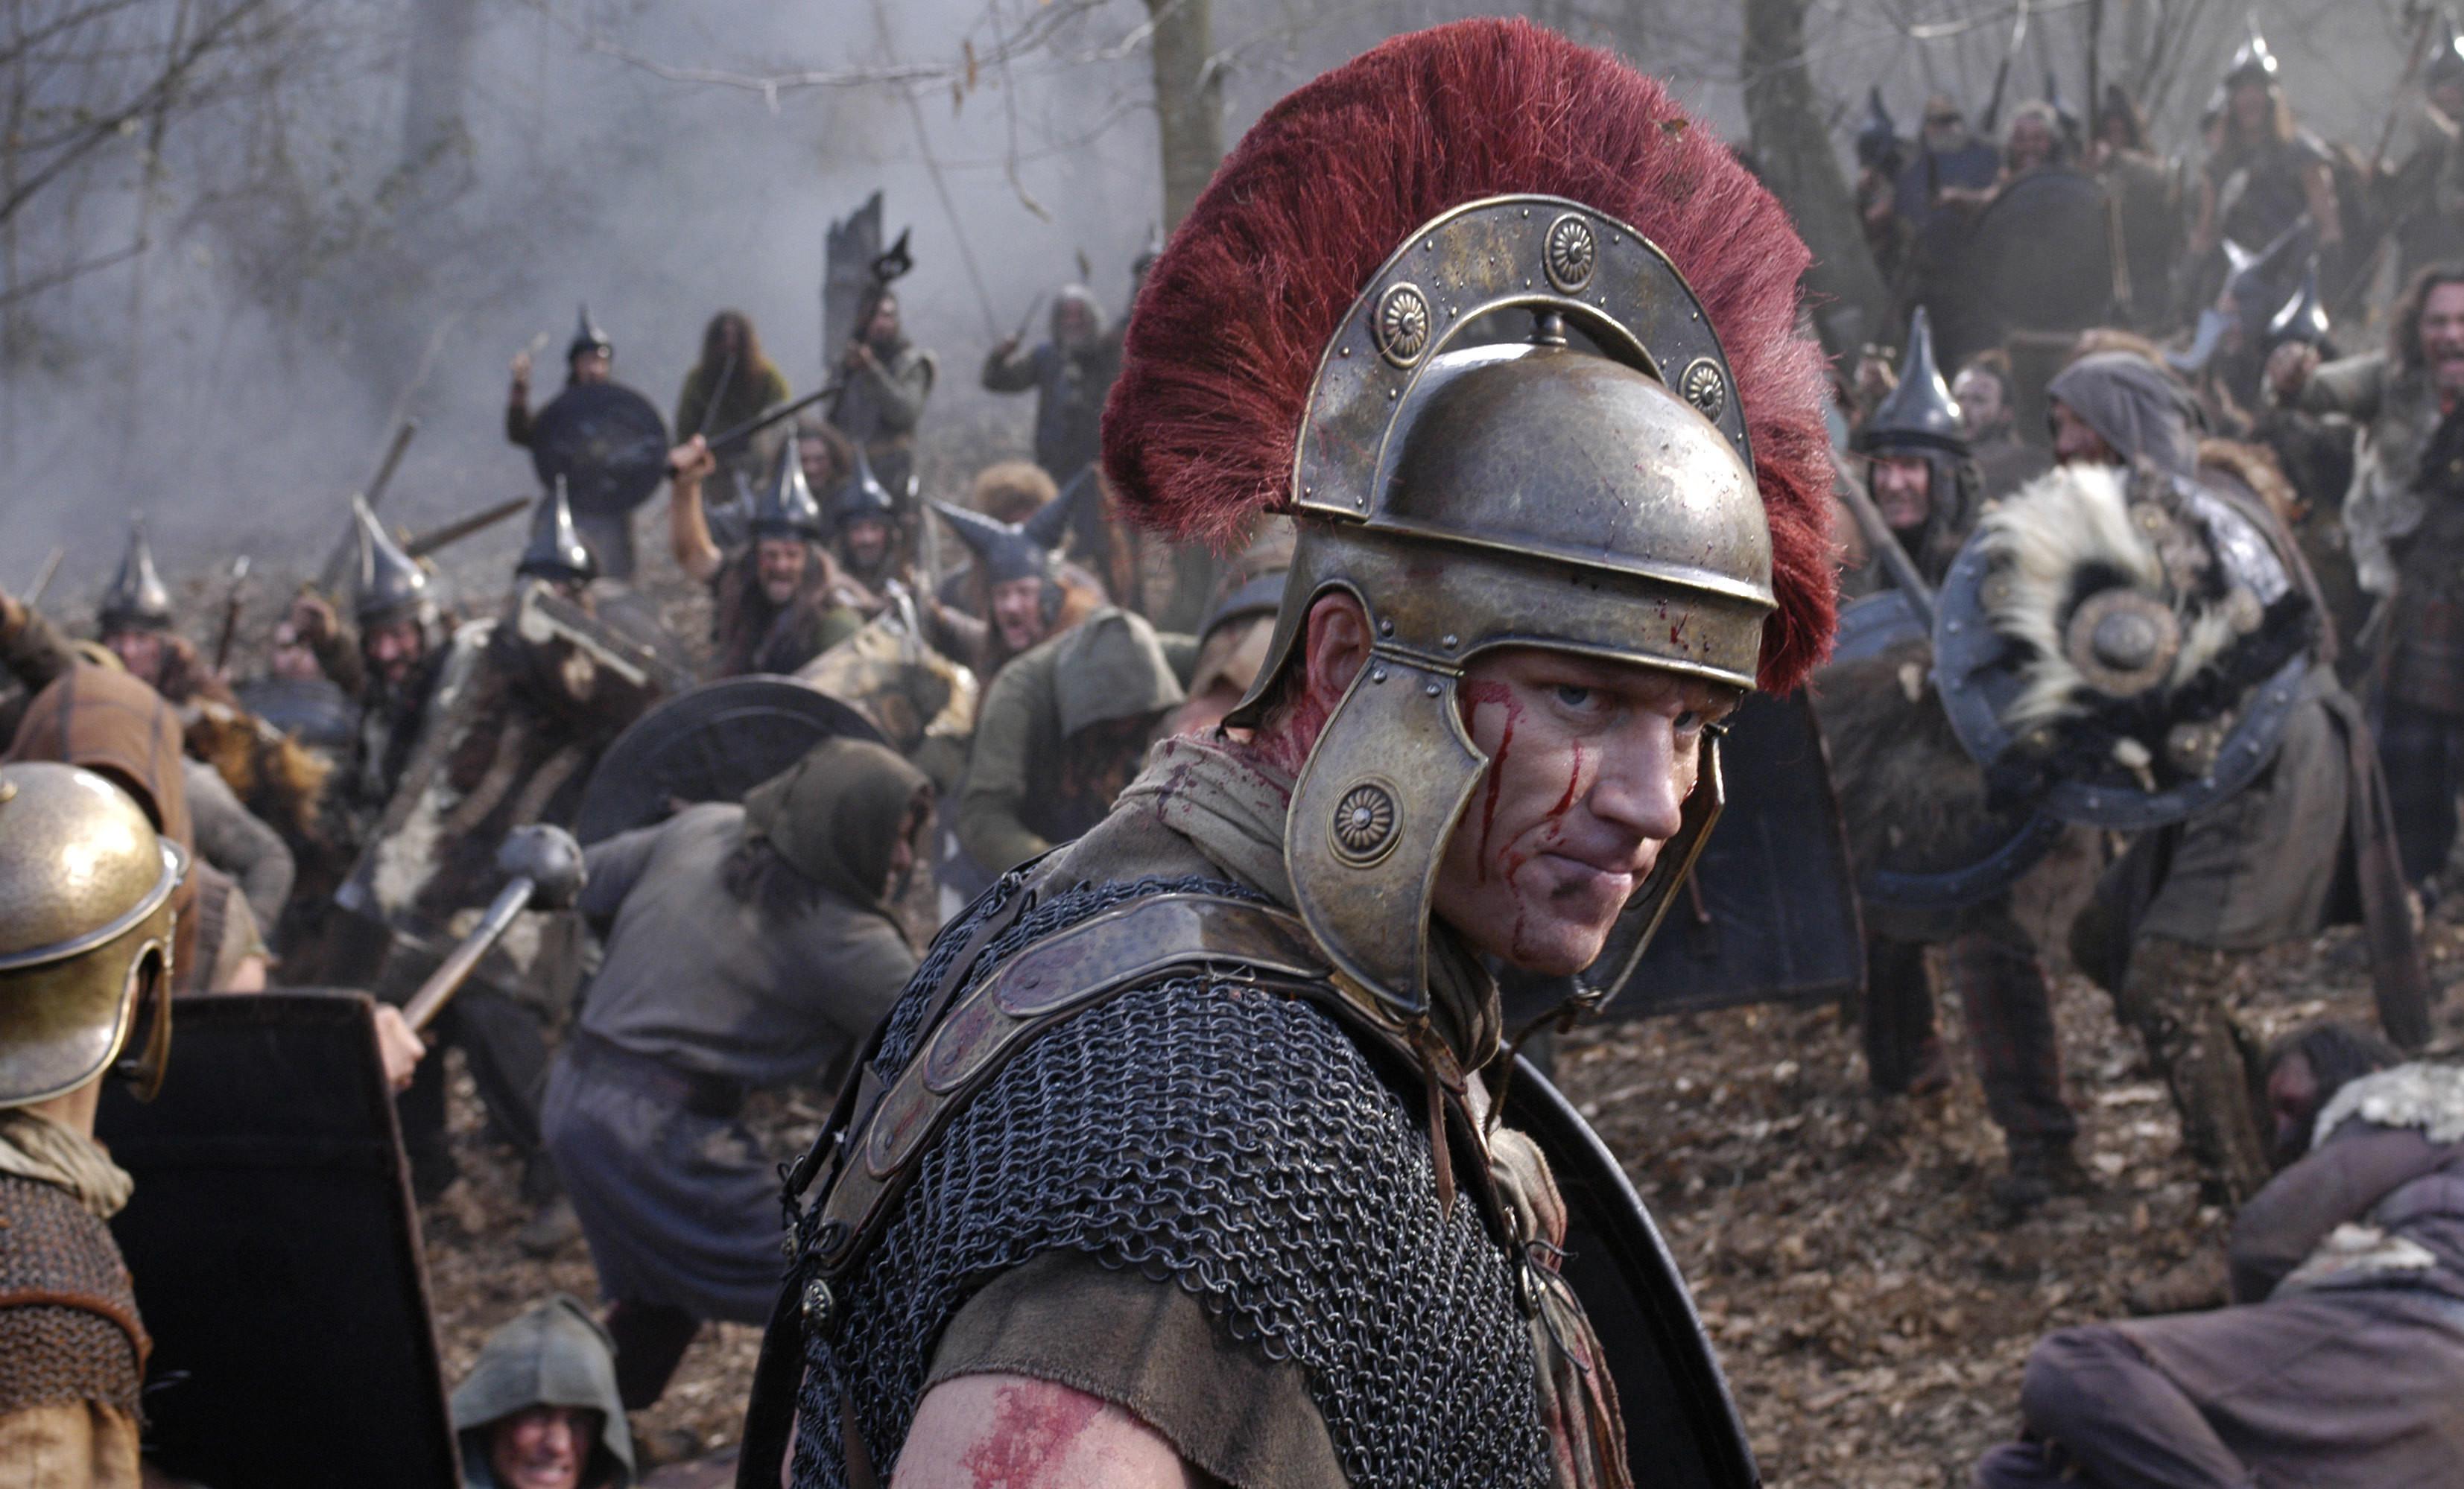 498679b9116b34313fb8a0e5a0a2d076.jpg (3307×1999)   Legions of Rome    Pinterest   Rome, Roman legion and Ancient rome